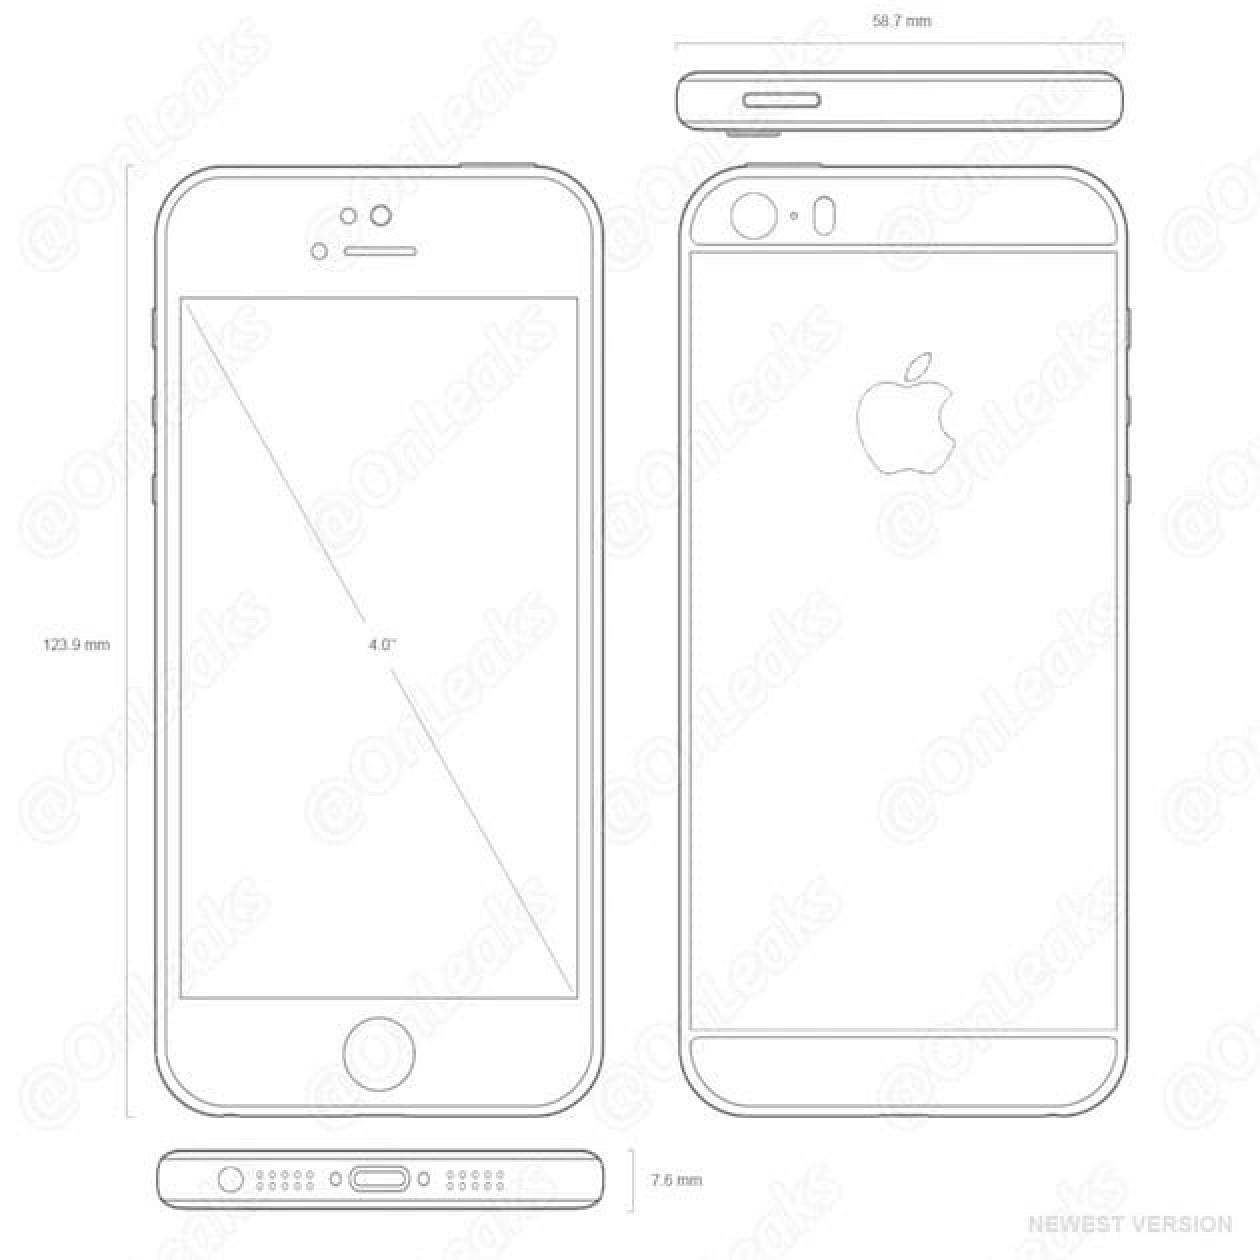 dizayn-iphone-5se-budet-identichen-iphone-5s-foto---